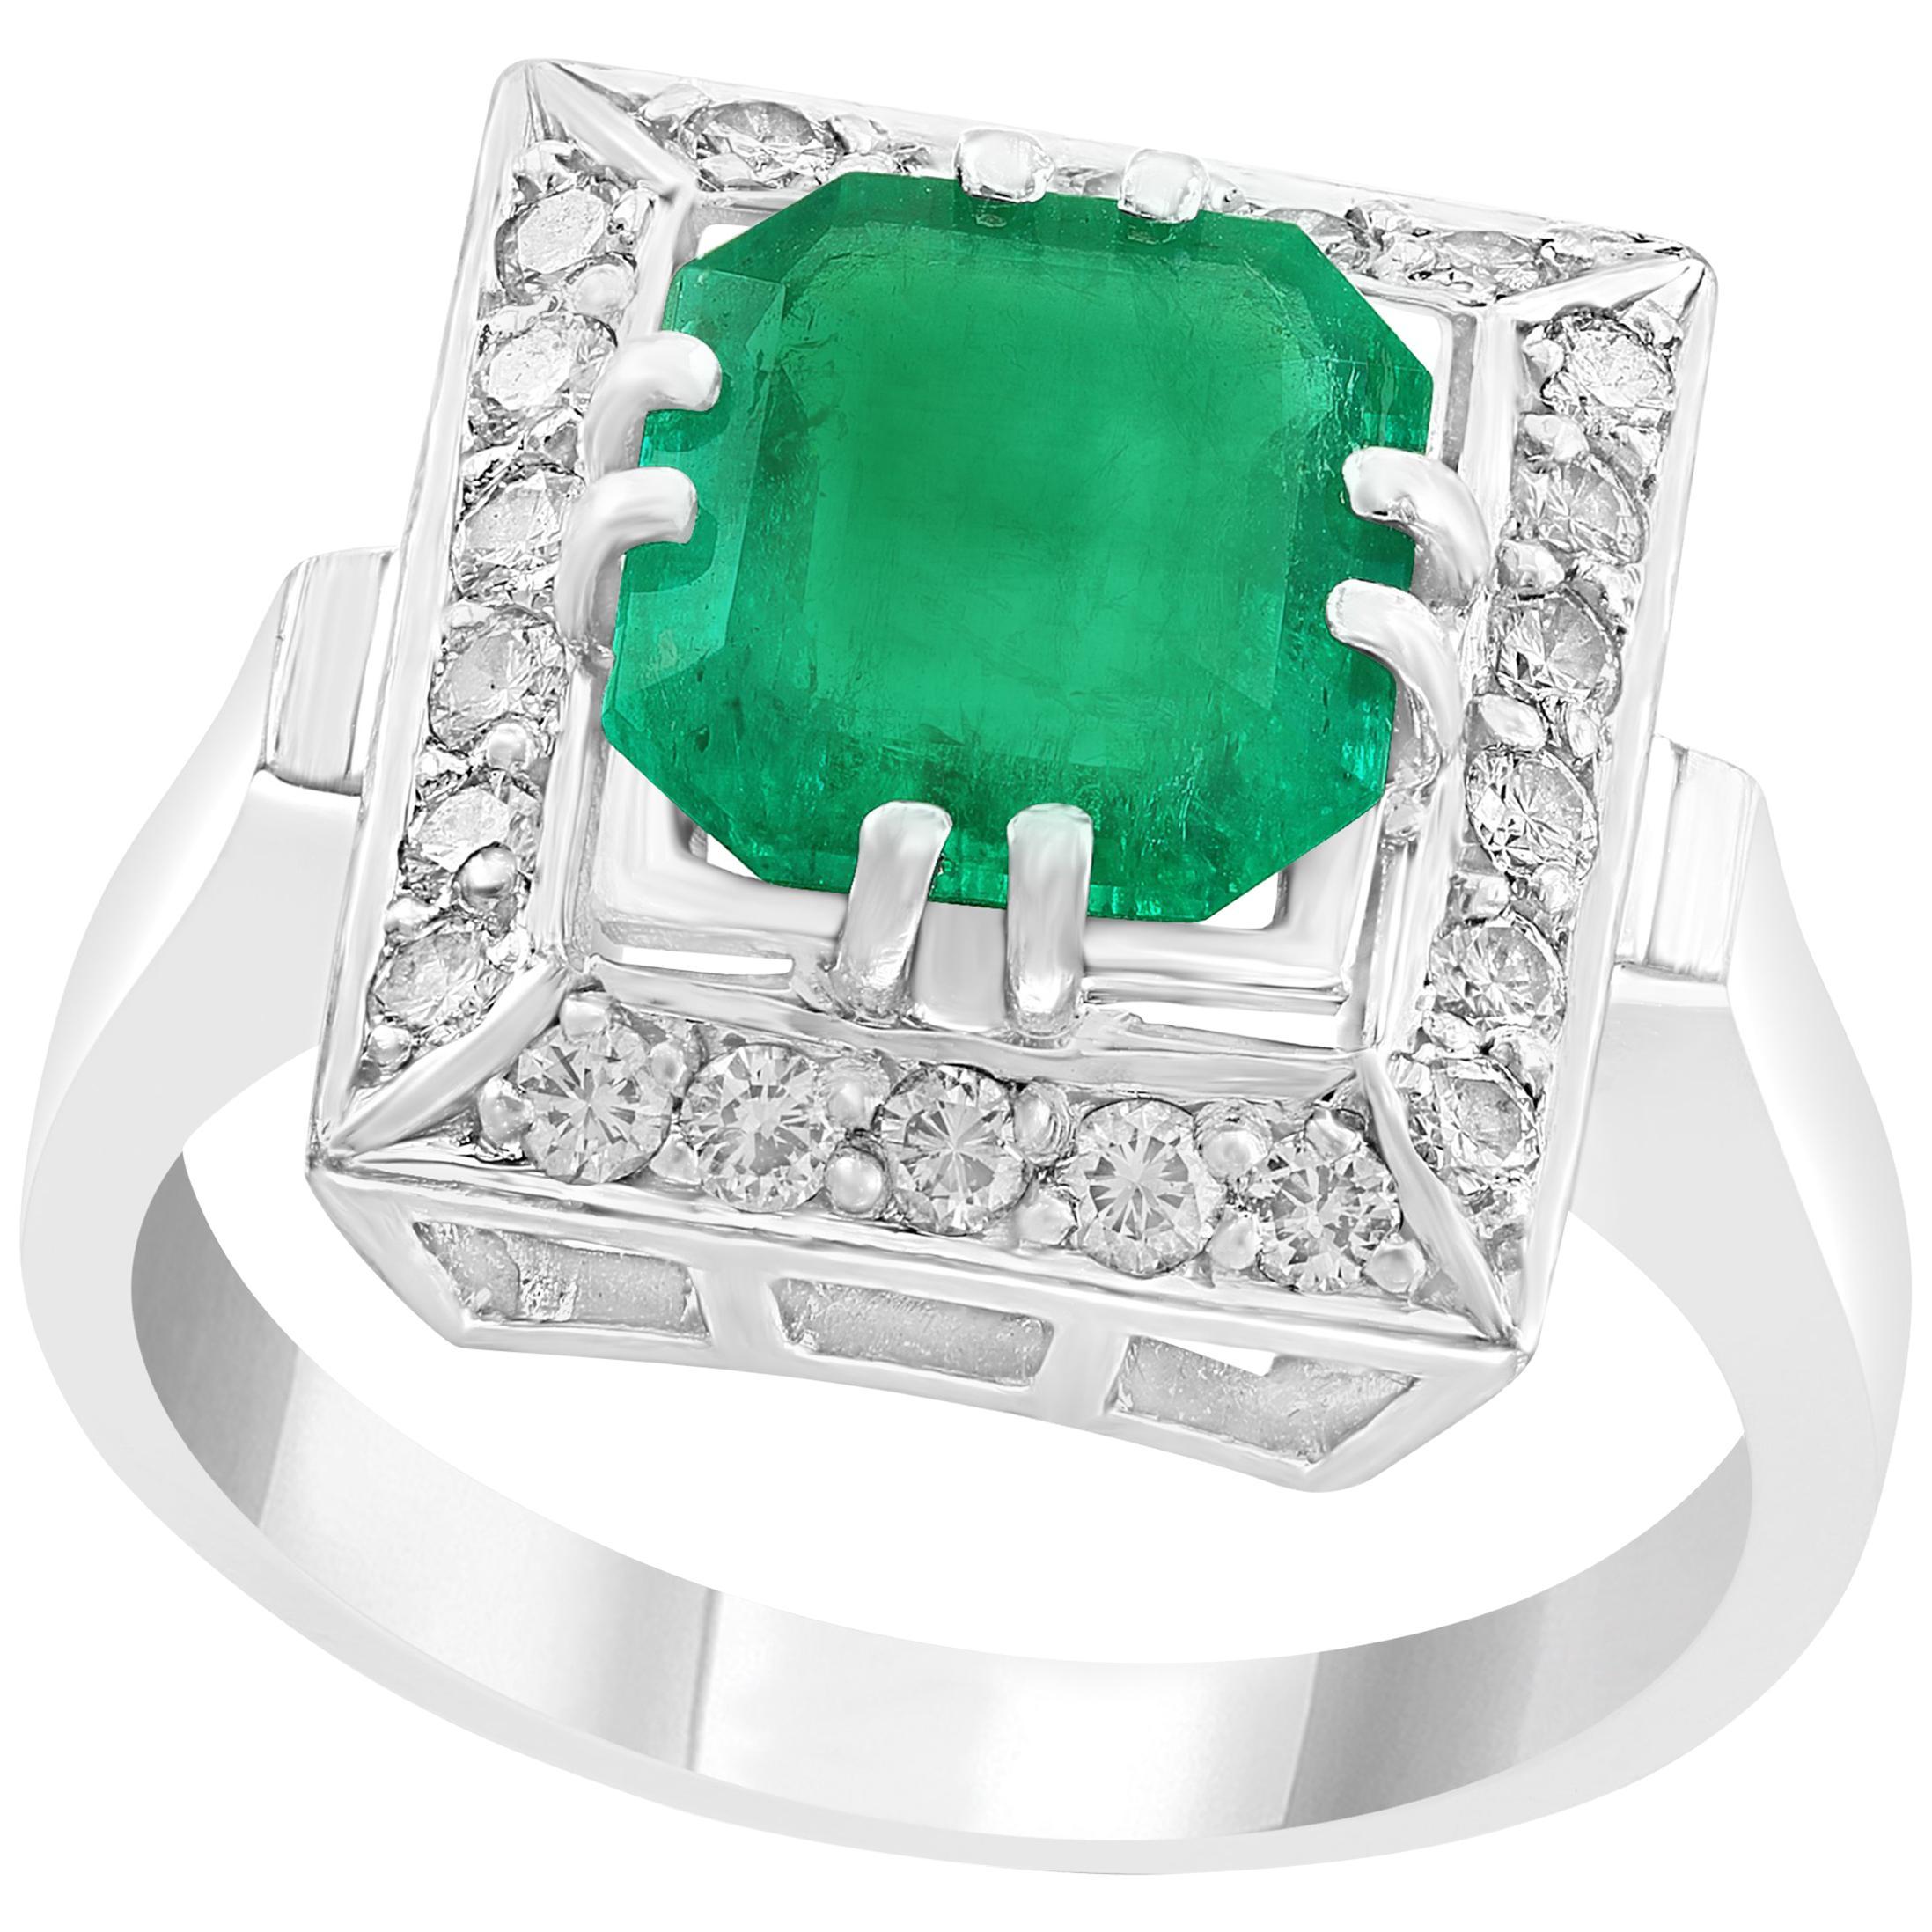 3 Carat Emerald Cut Colombian Emerald and Diamond 18 Karat Gold Ring Estate